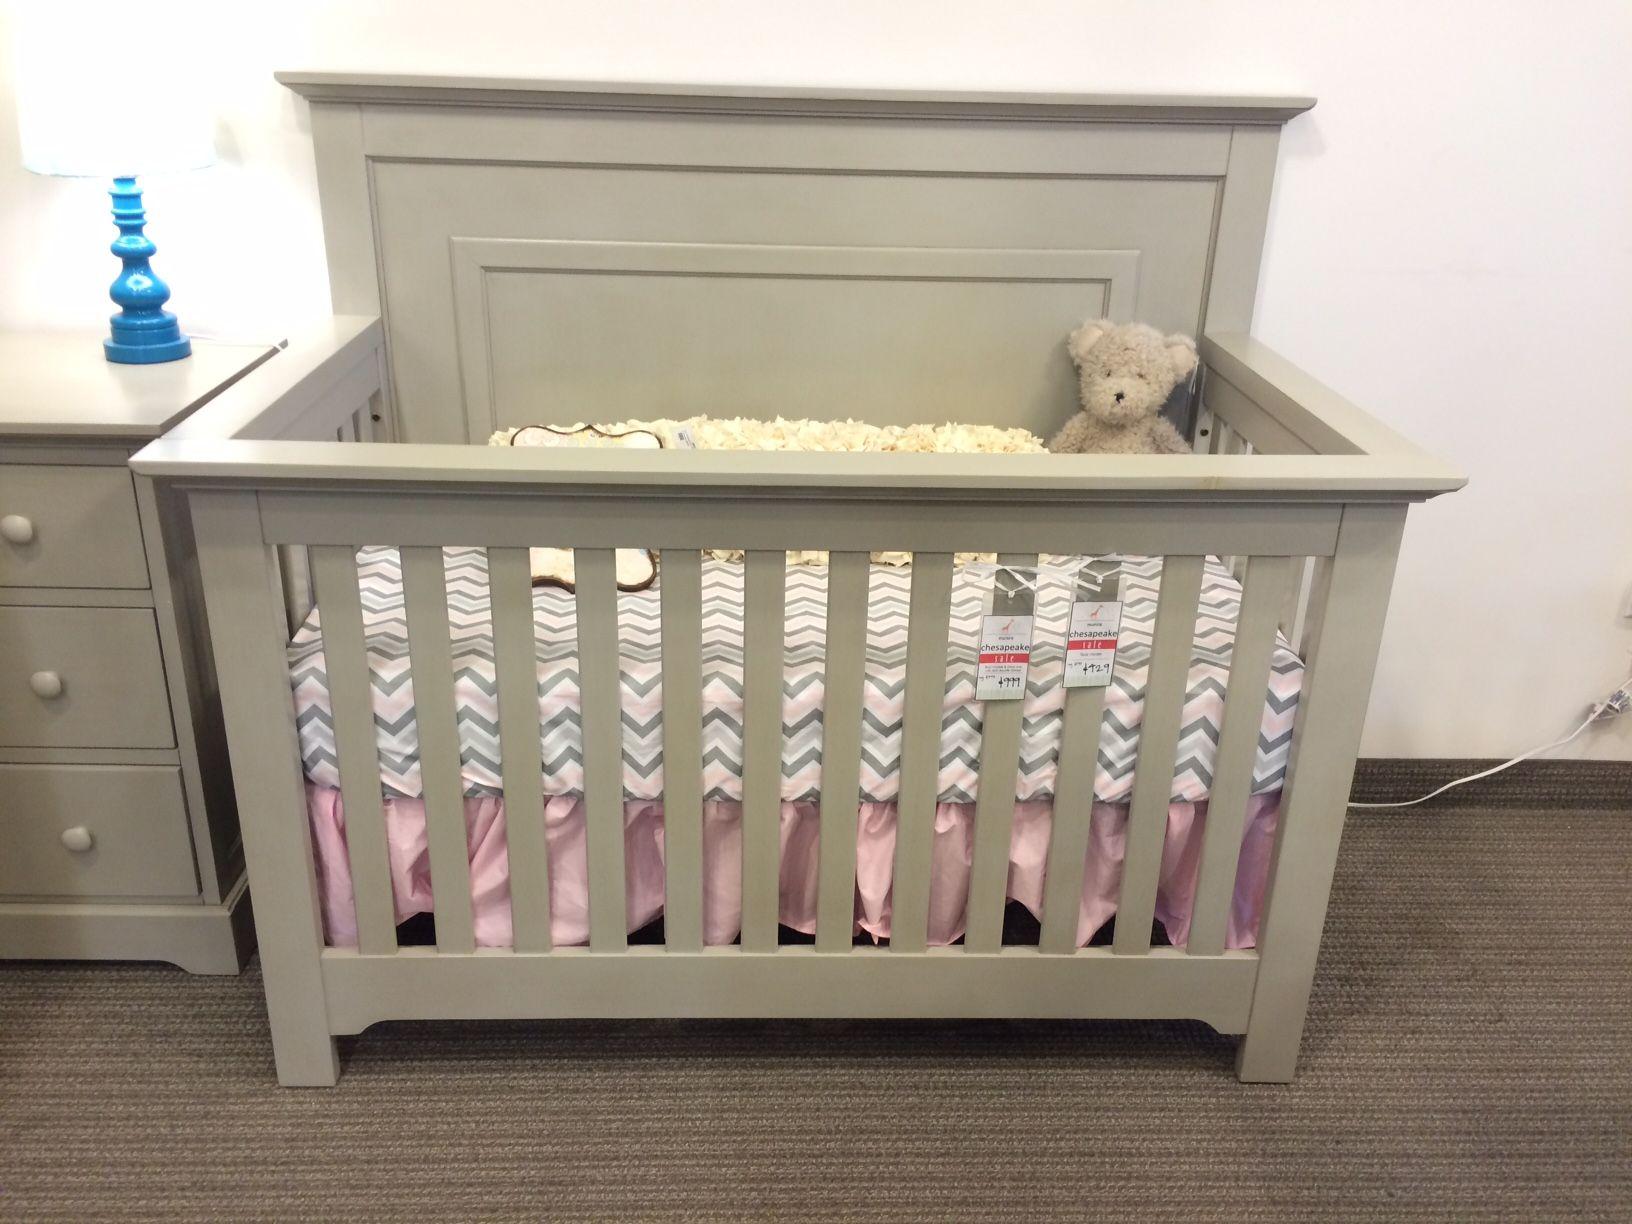 Munire chesapeake panel crib in light gray reg 579 sale 429